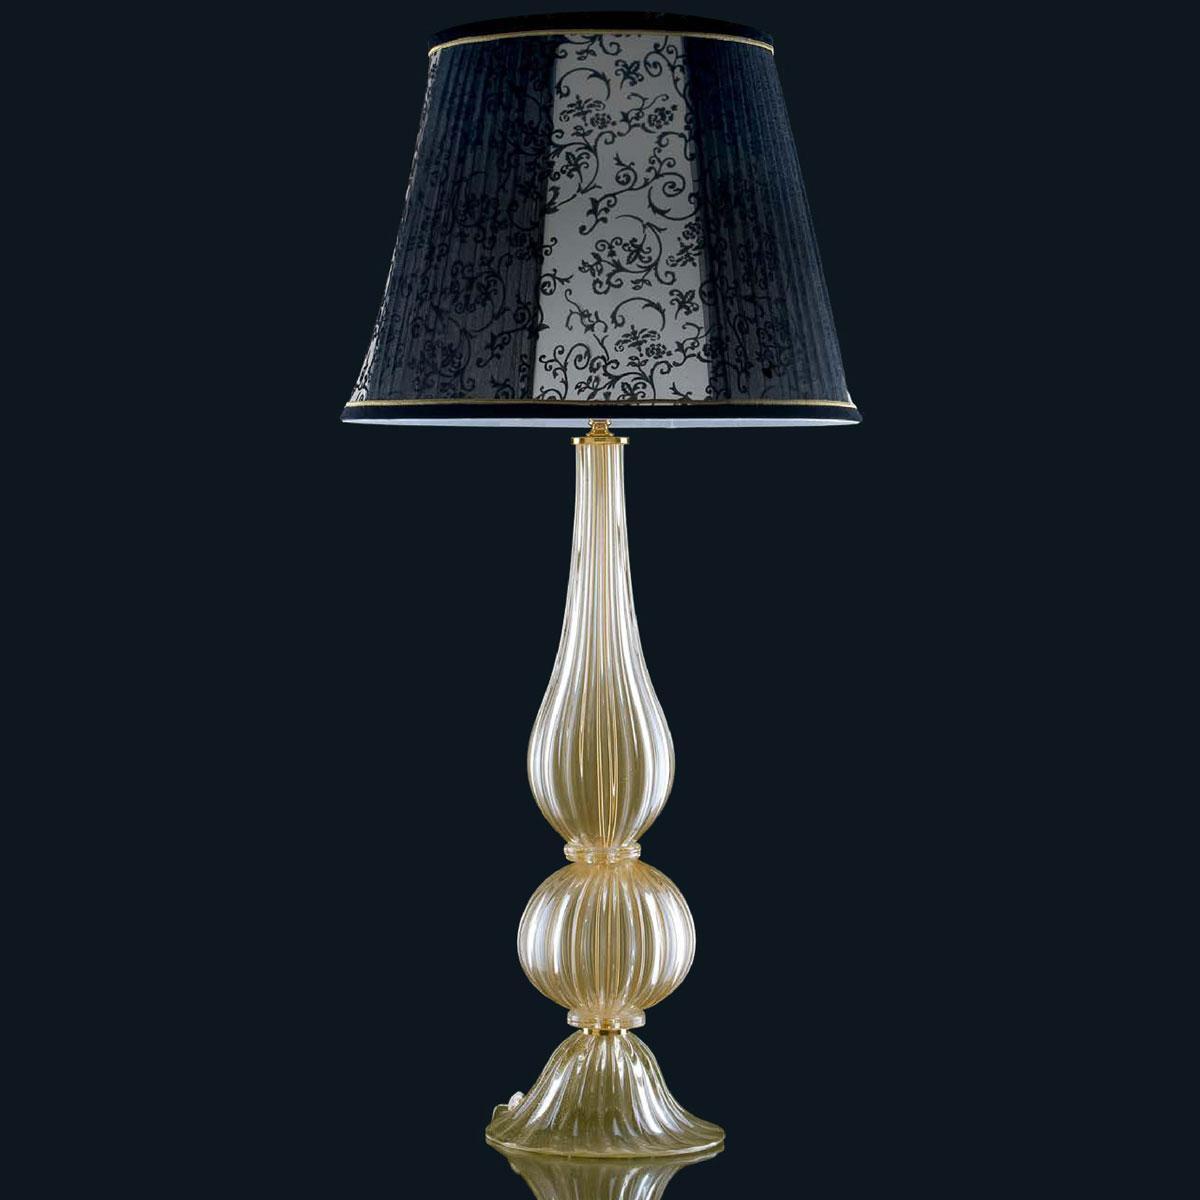 """Josie"" lampe de table en verre de Murano - 1 lumière - or"